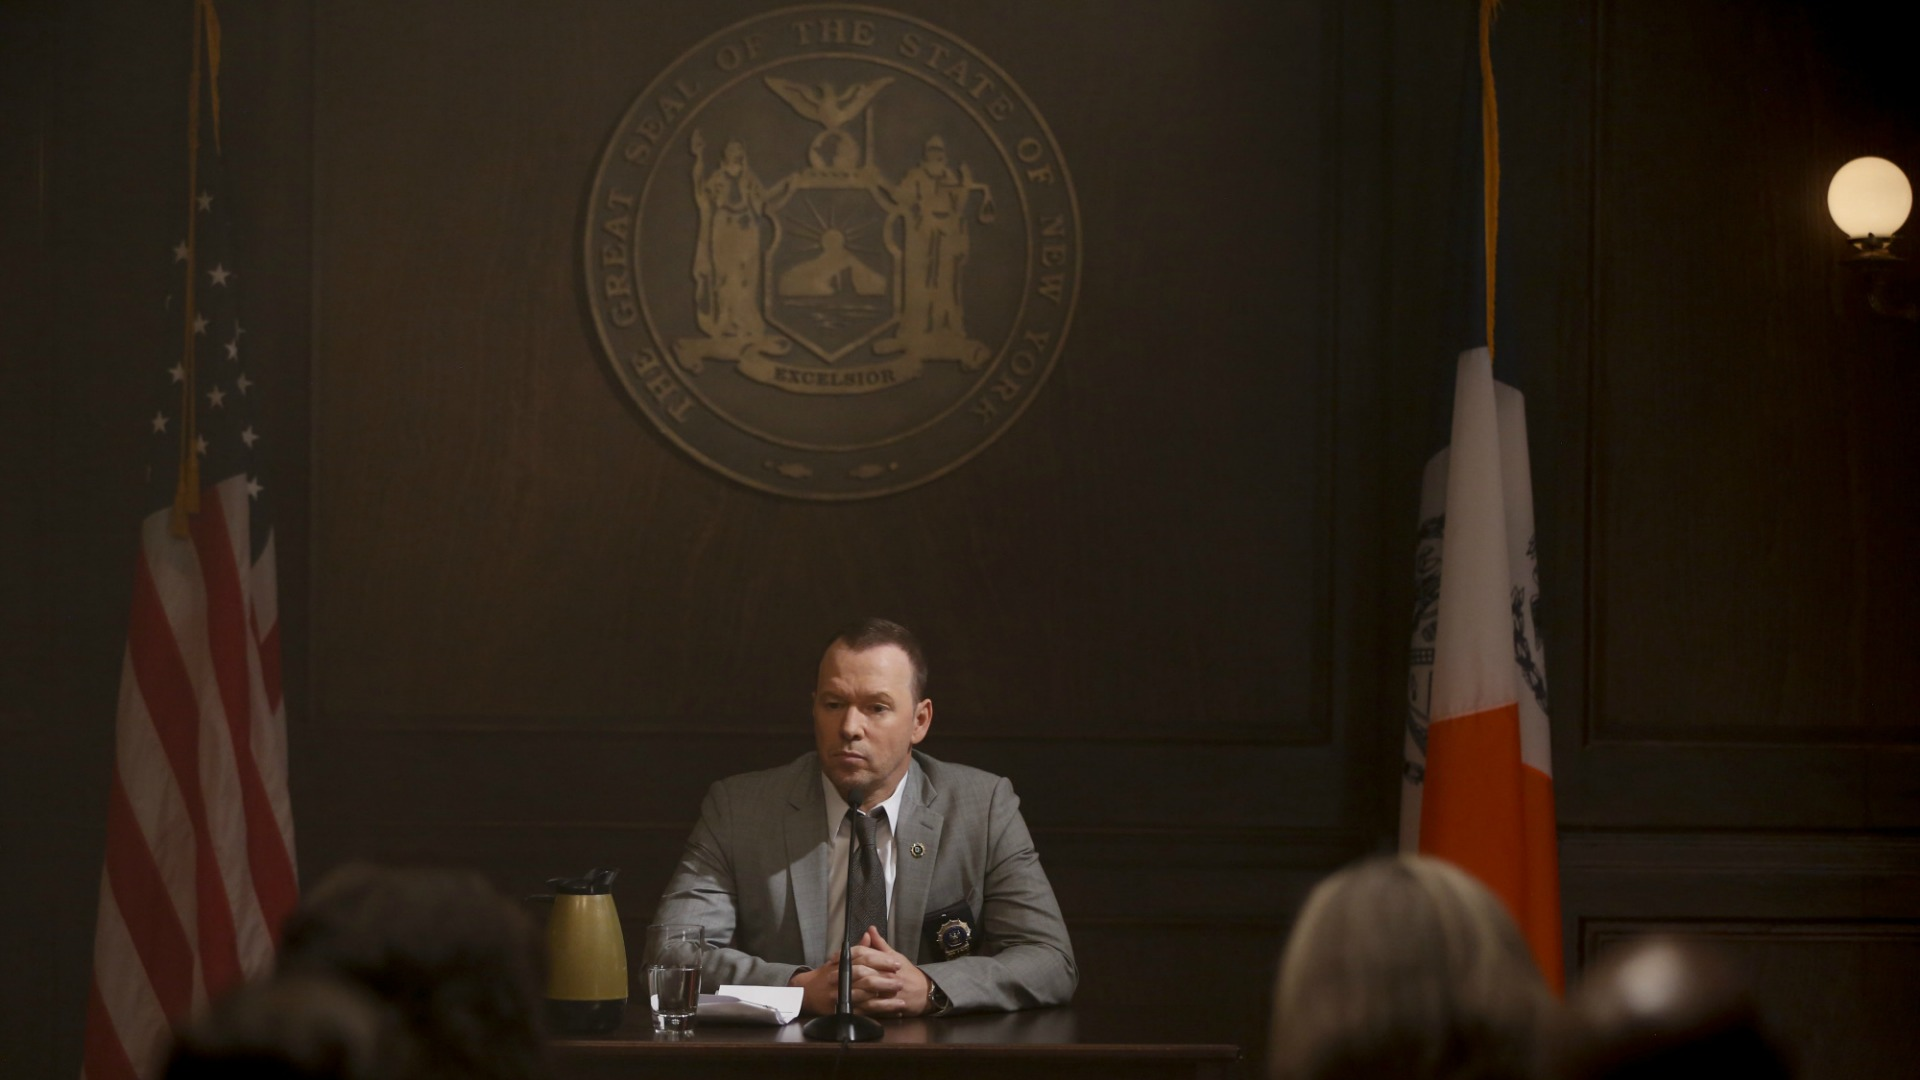 Danny awaits the grand jury's decision.